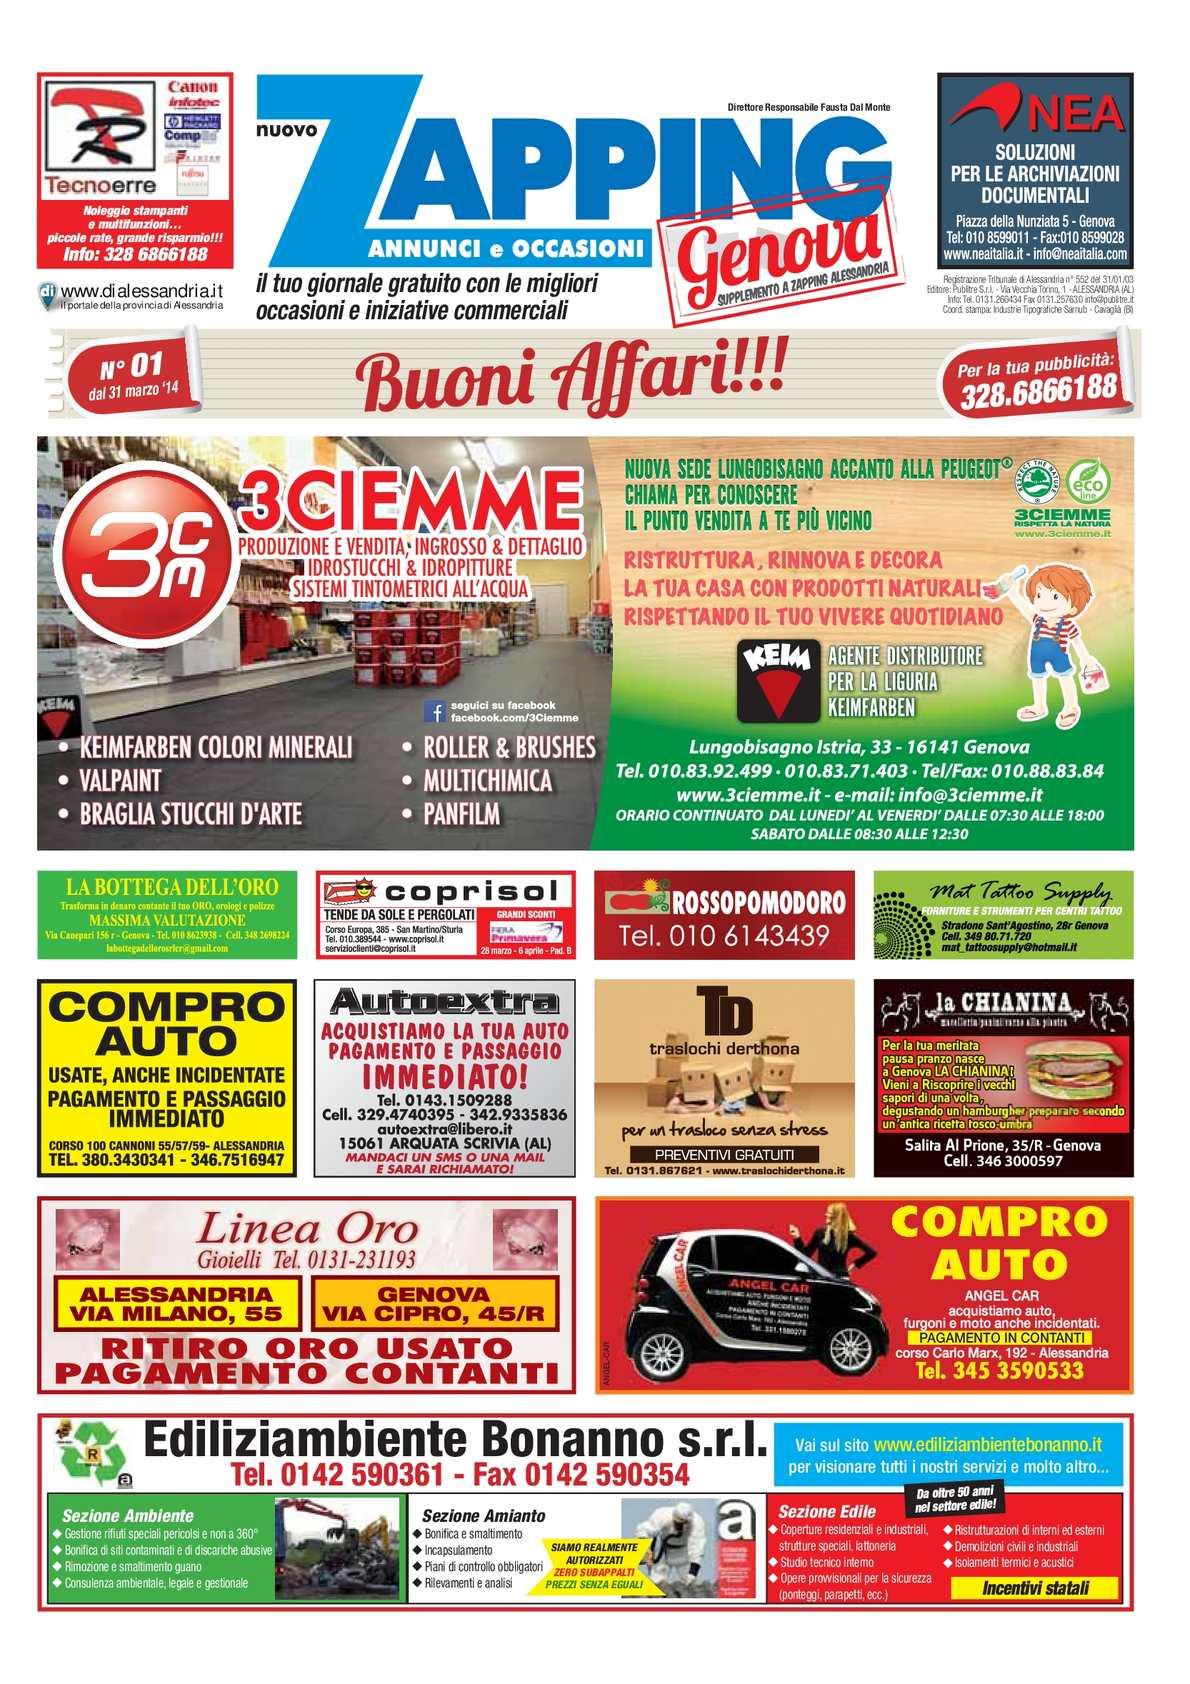 Calaméo - Zapping Genova N° 01/2014 del 31/03/2014